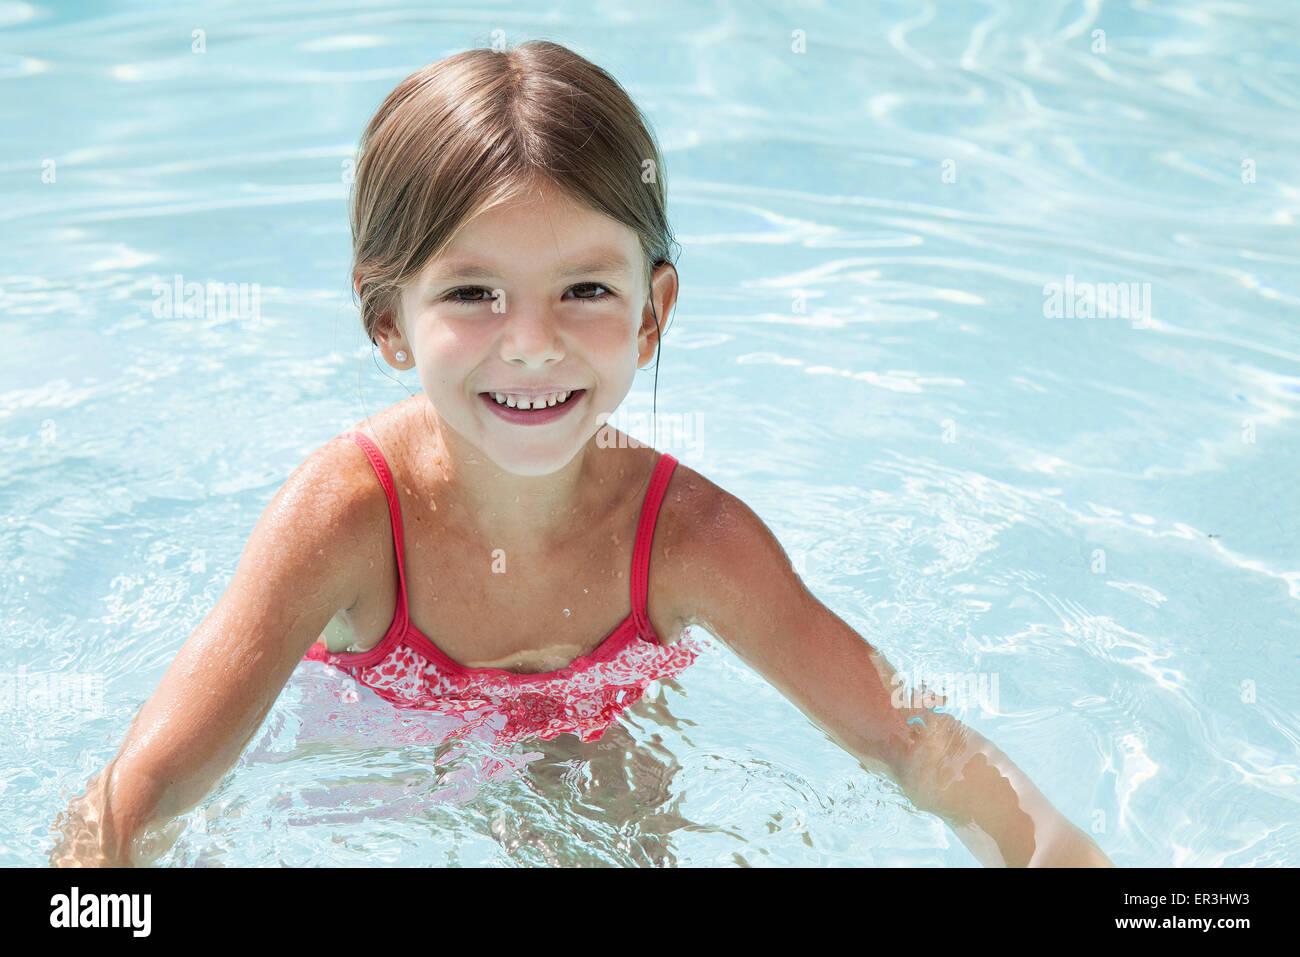 Girl swimming in pool, portrait - Stock Image